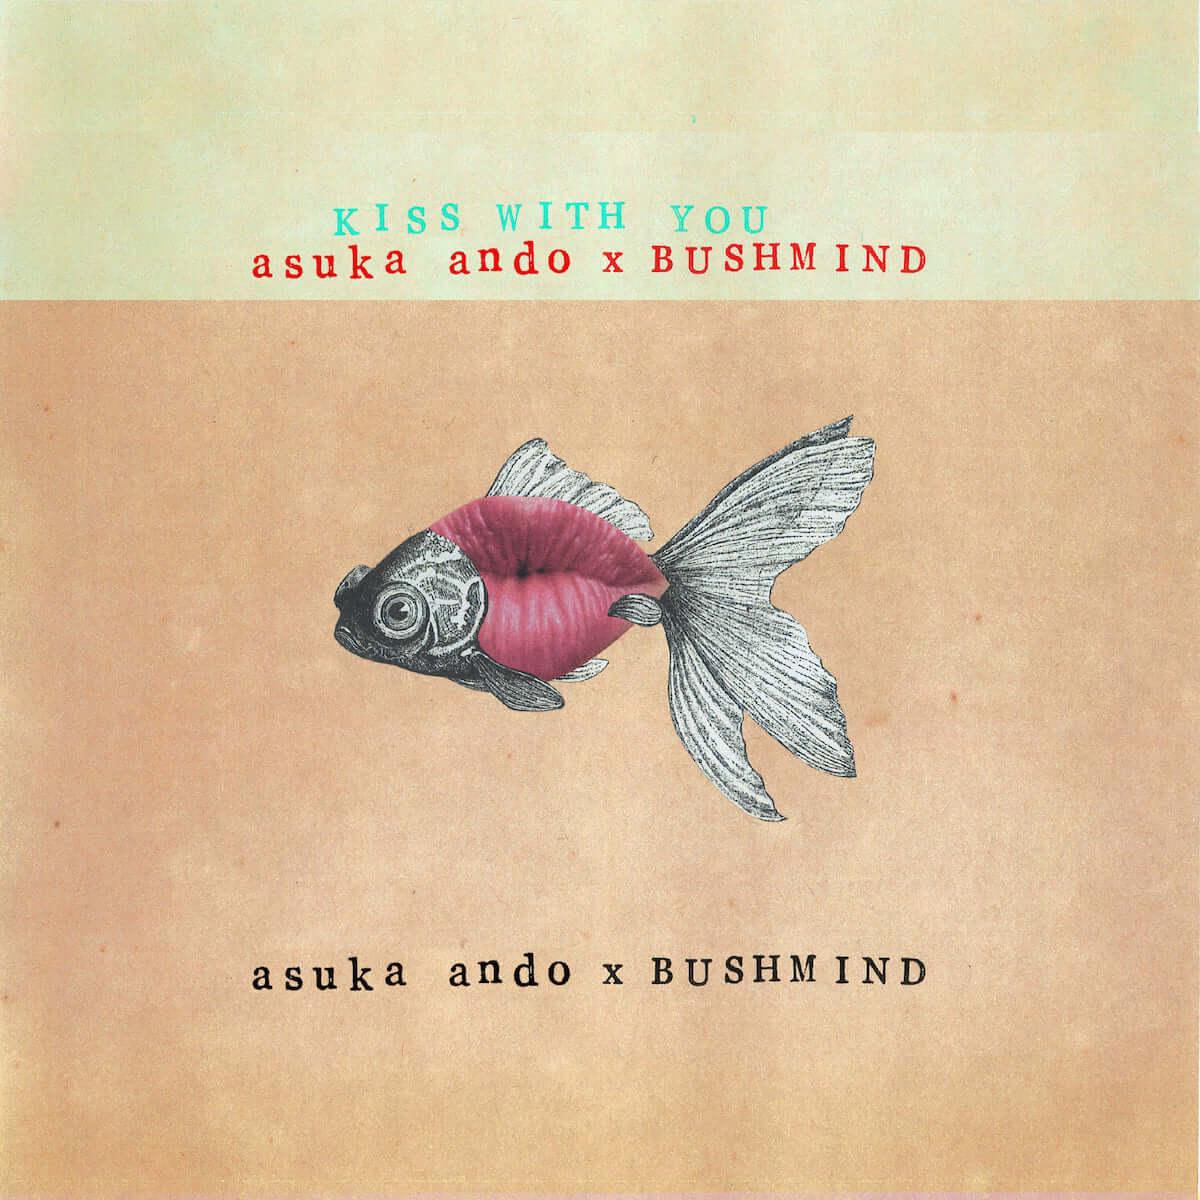 Bushmindとasuka andoのコラボシングルが7inchで3月にリリース|B面にはB面にはsugar plantによるDub remixも music190214-bushmind-asuka-ando-3-1200x1200